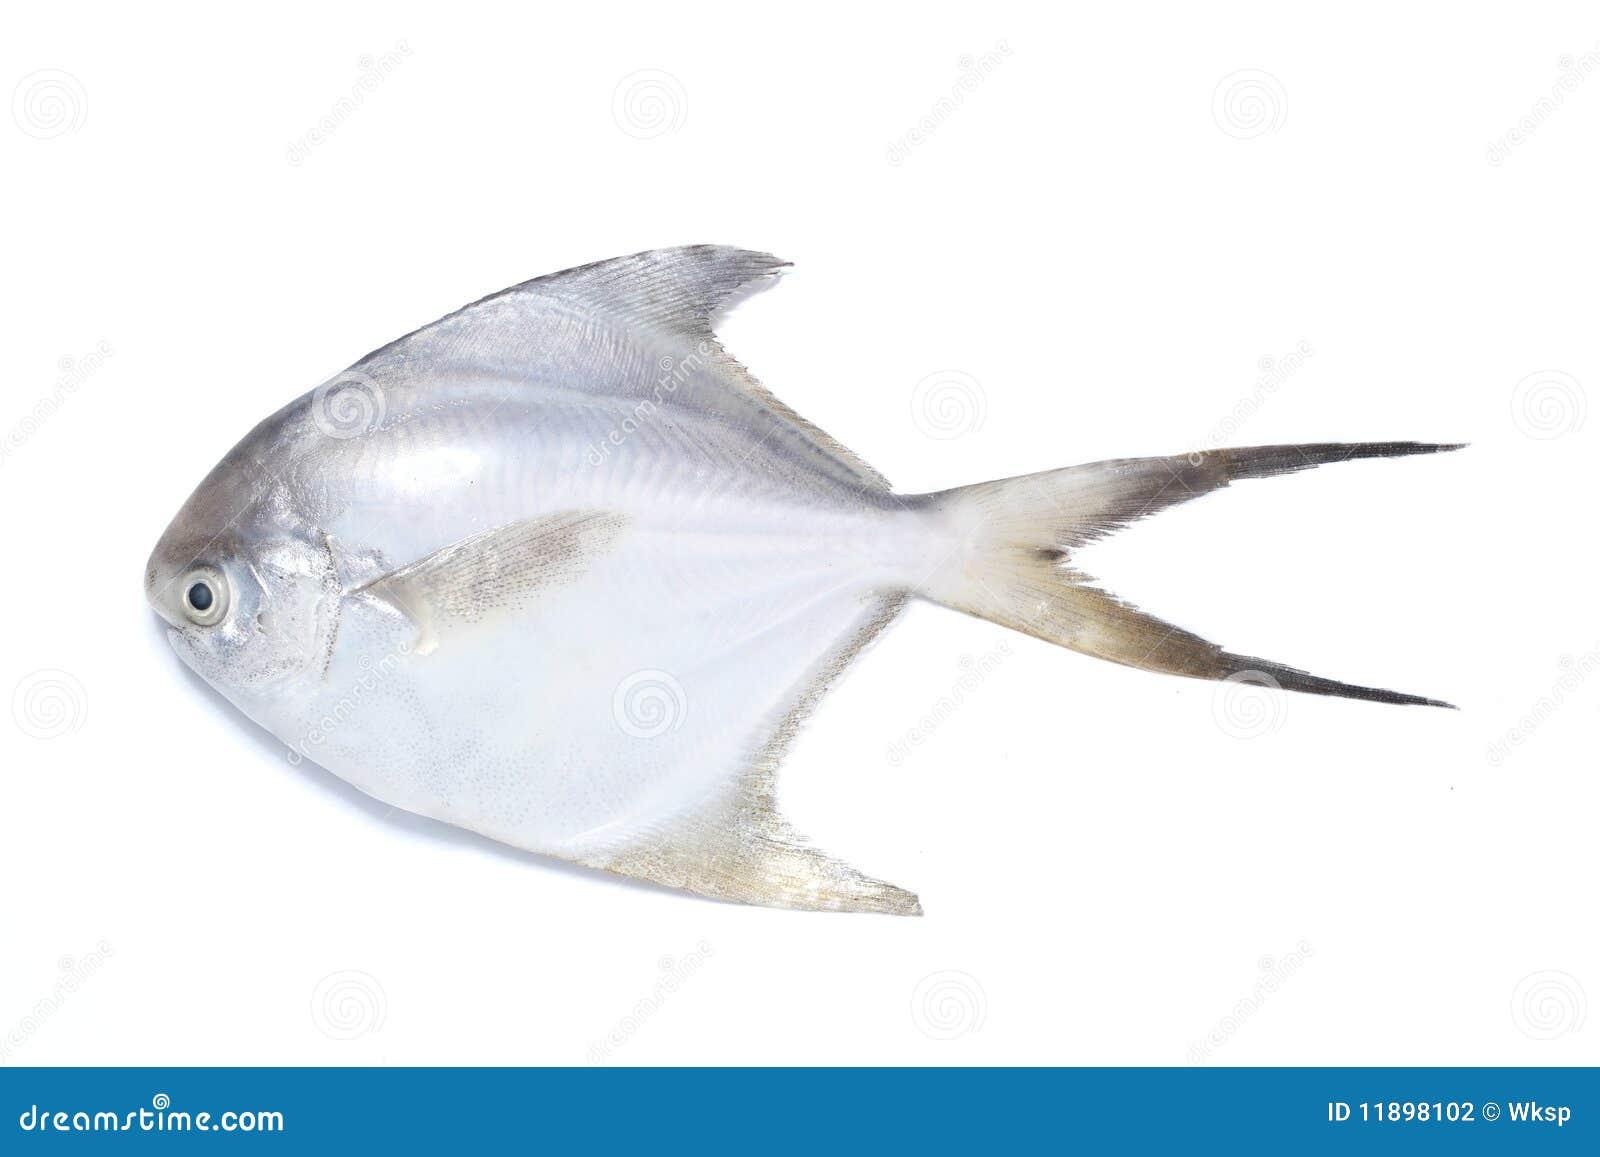 Pomfret fish stock photo. Image of fish, fins, fresh - 11898102